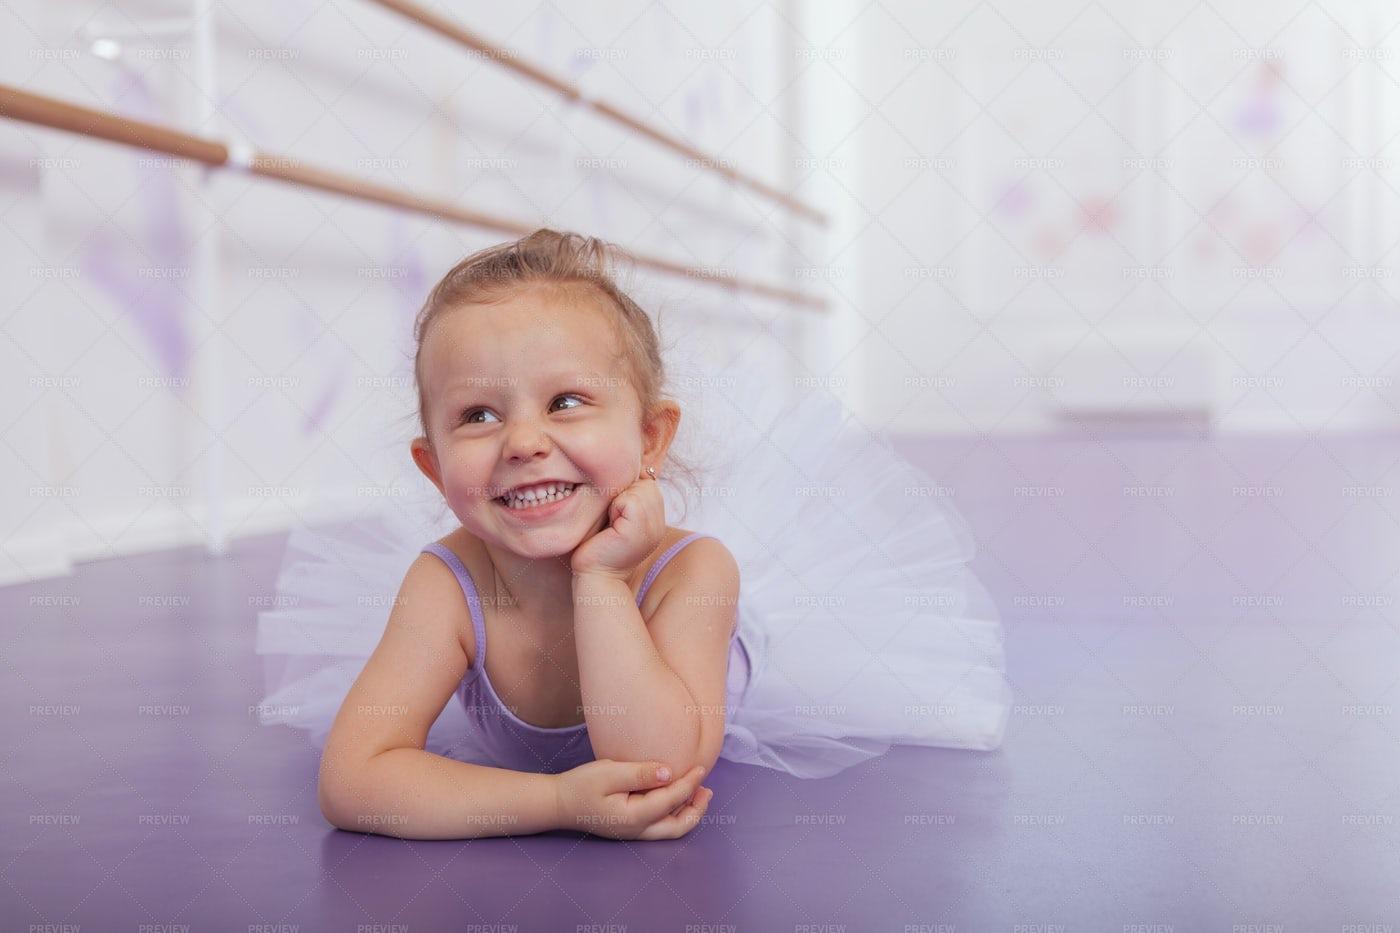 Ballerina In The Studio: Stock Photos